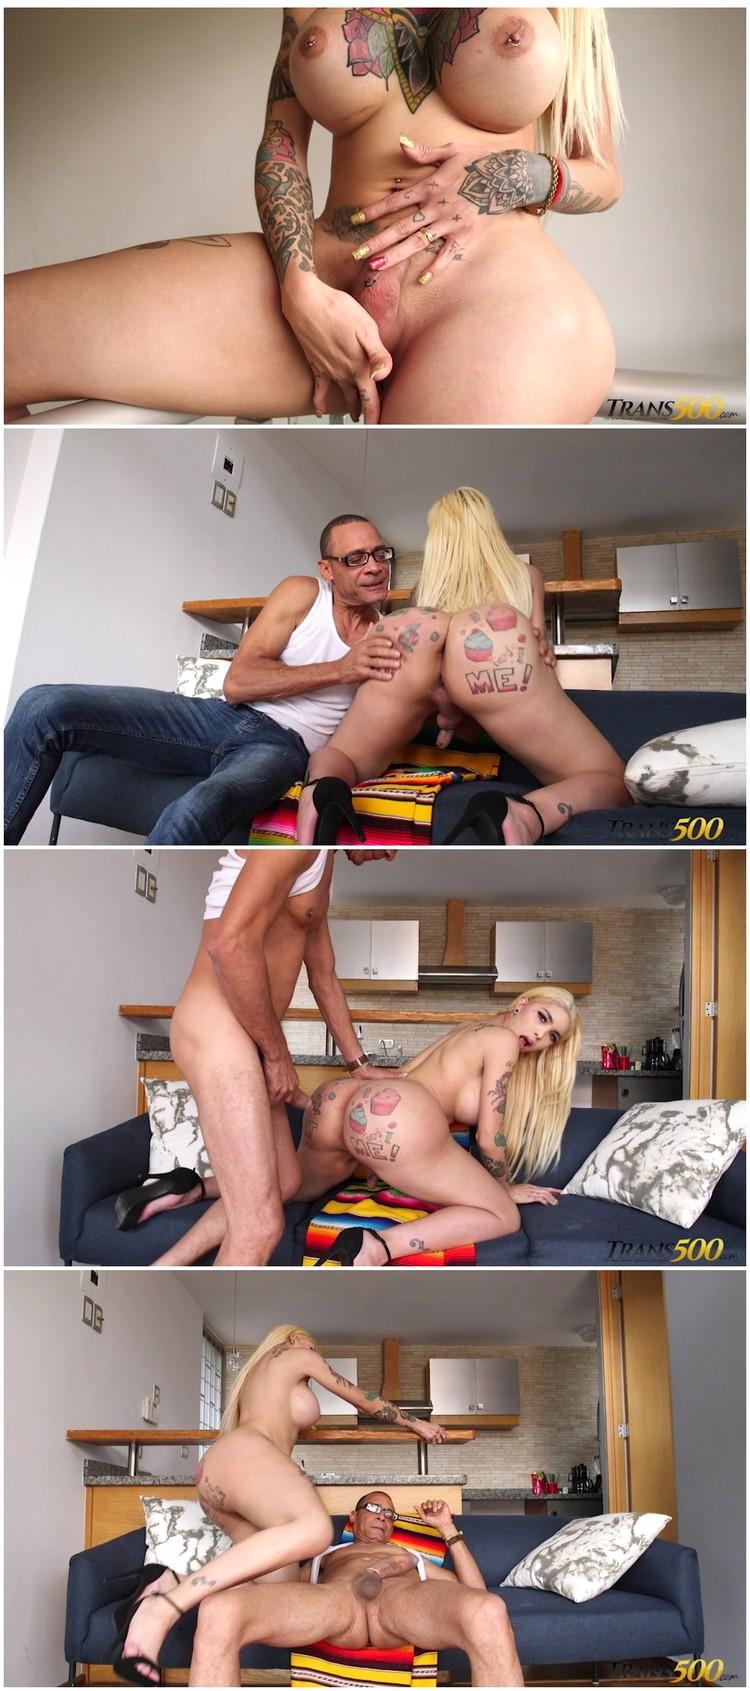 Shemale-LadyboyTranssexualVZ054_cover_l.jpg